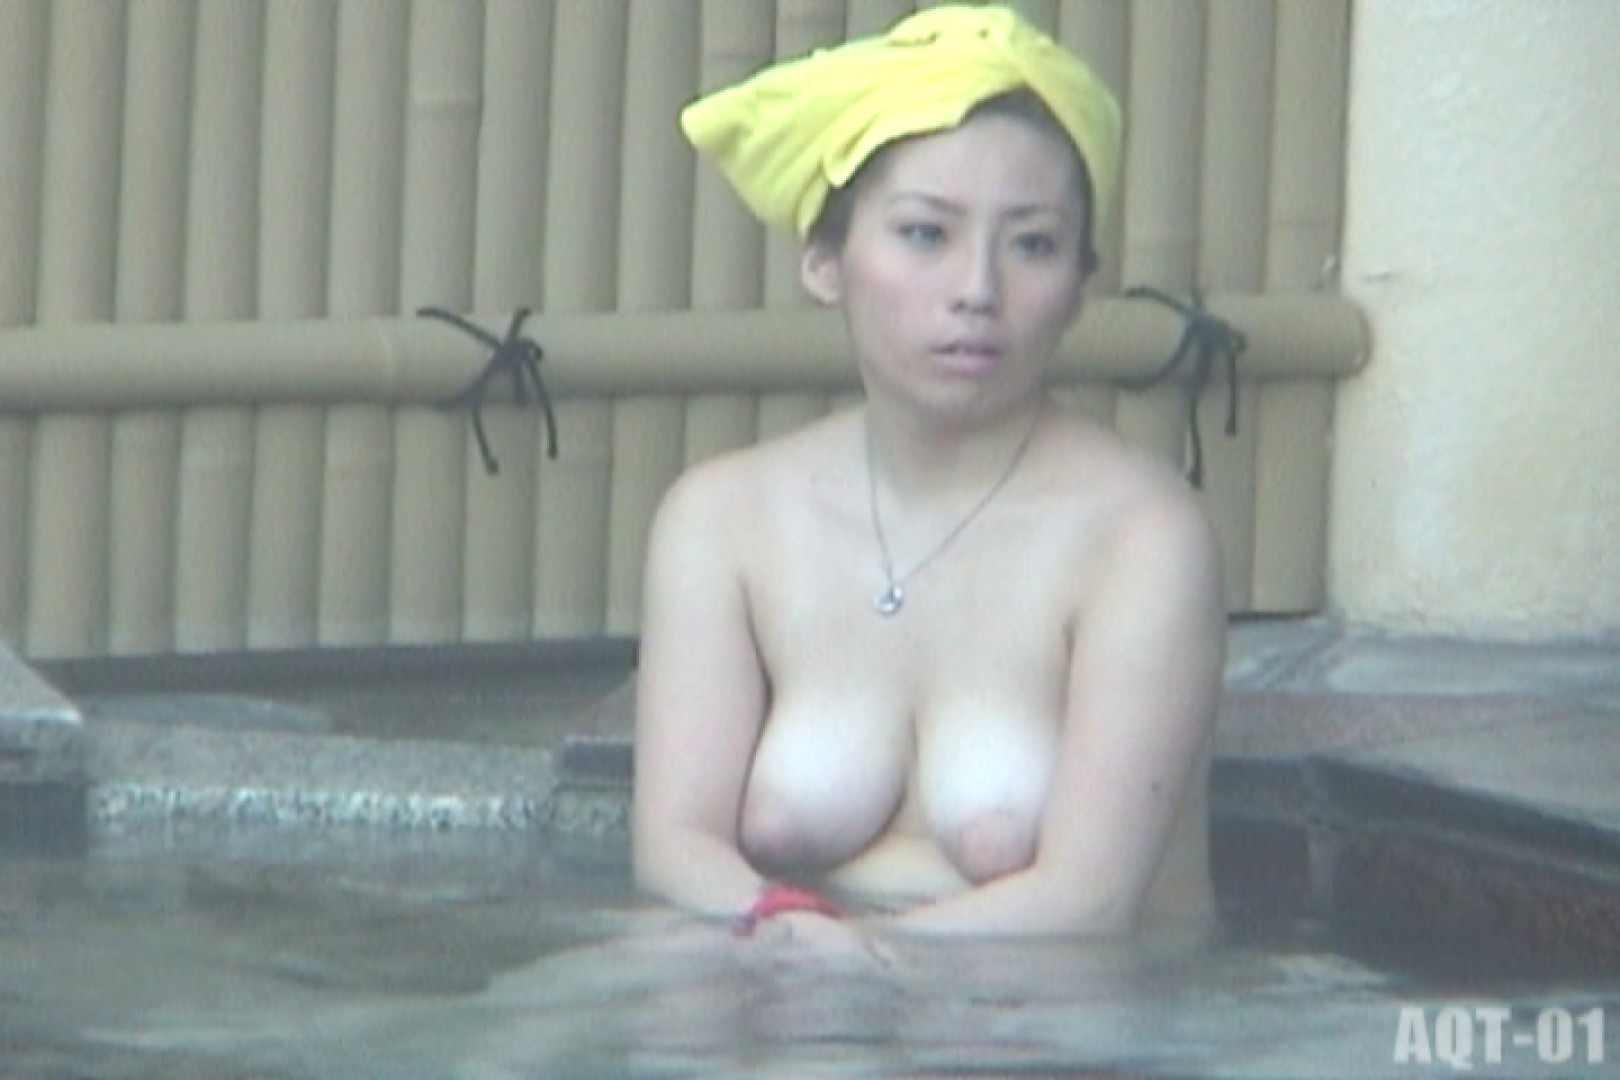 Aquaな露天風呂Vol.713 盗撮シリーズ | 露天風呂編  106PIX 45